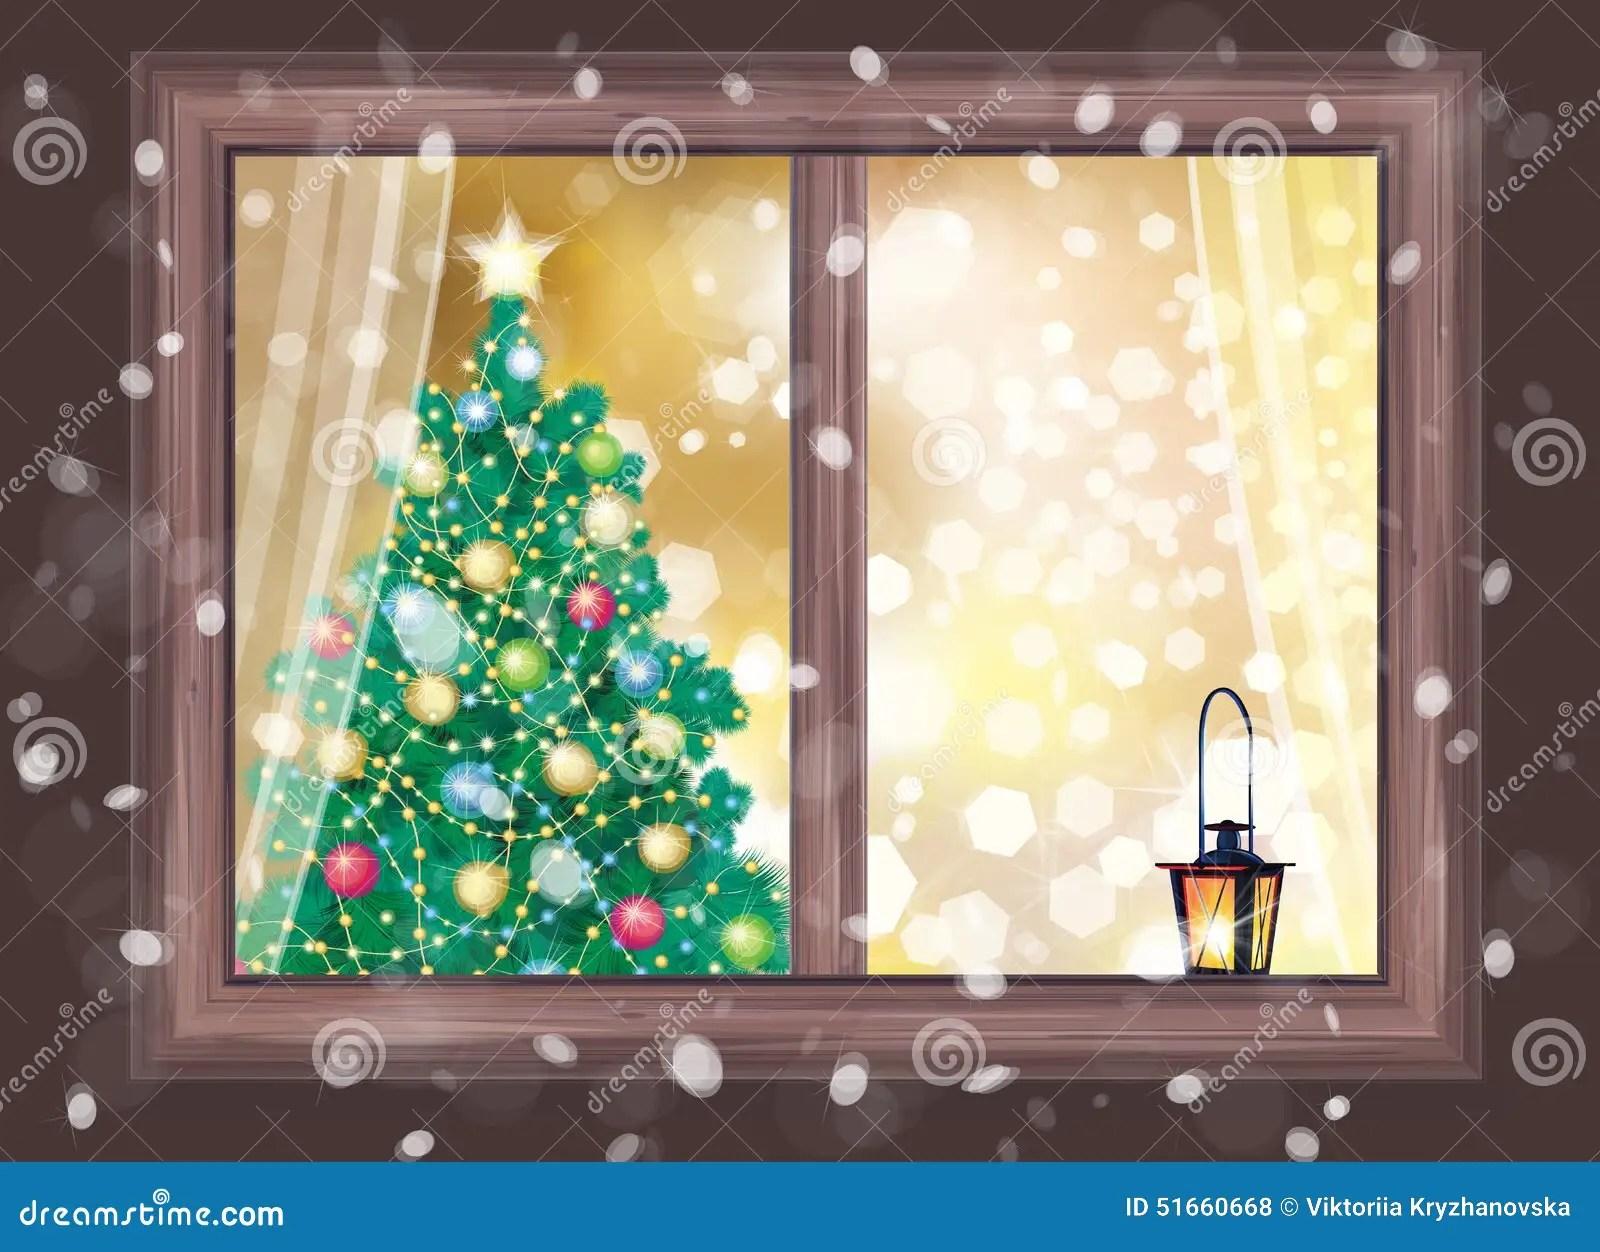 Vector Winter Night Scene Of Window With Christmas Tree